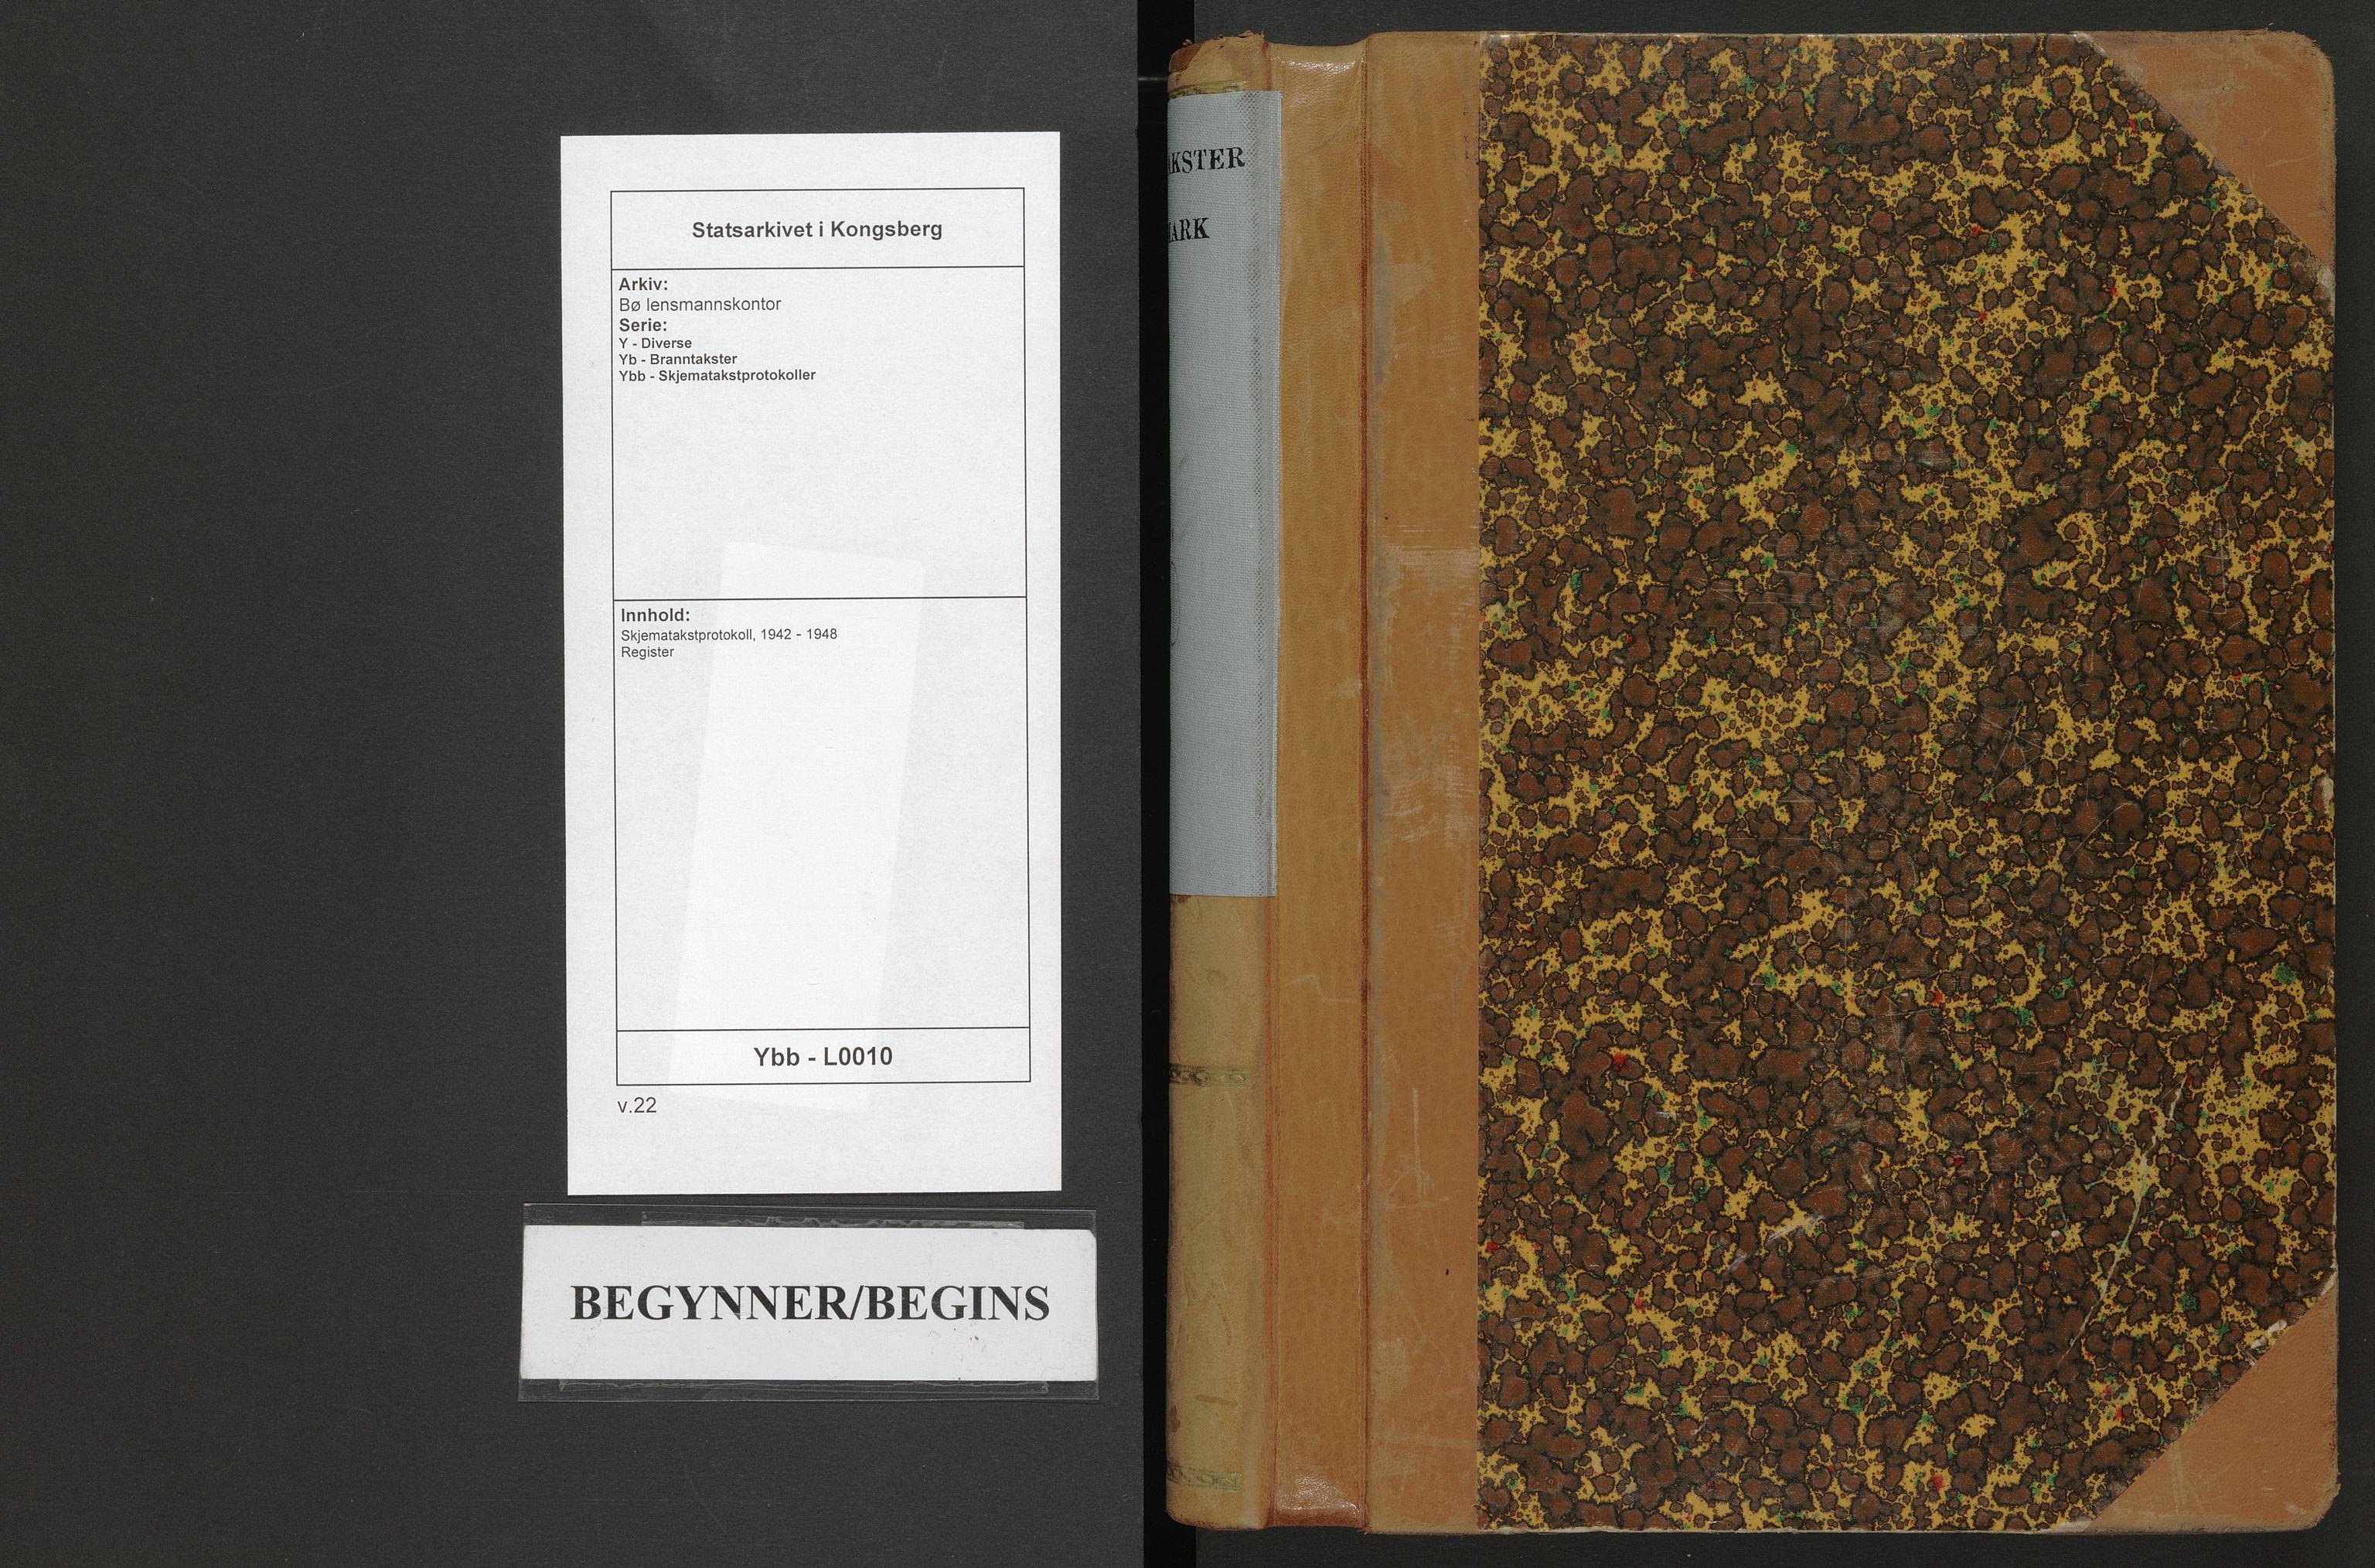 SAKO, Bø lensmannskontor, Y/Yb/Ybb/L0010: Skjematakstprotokoll, 1942-1948